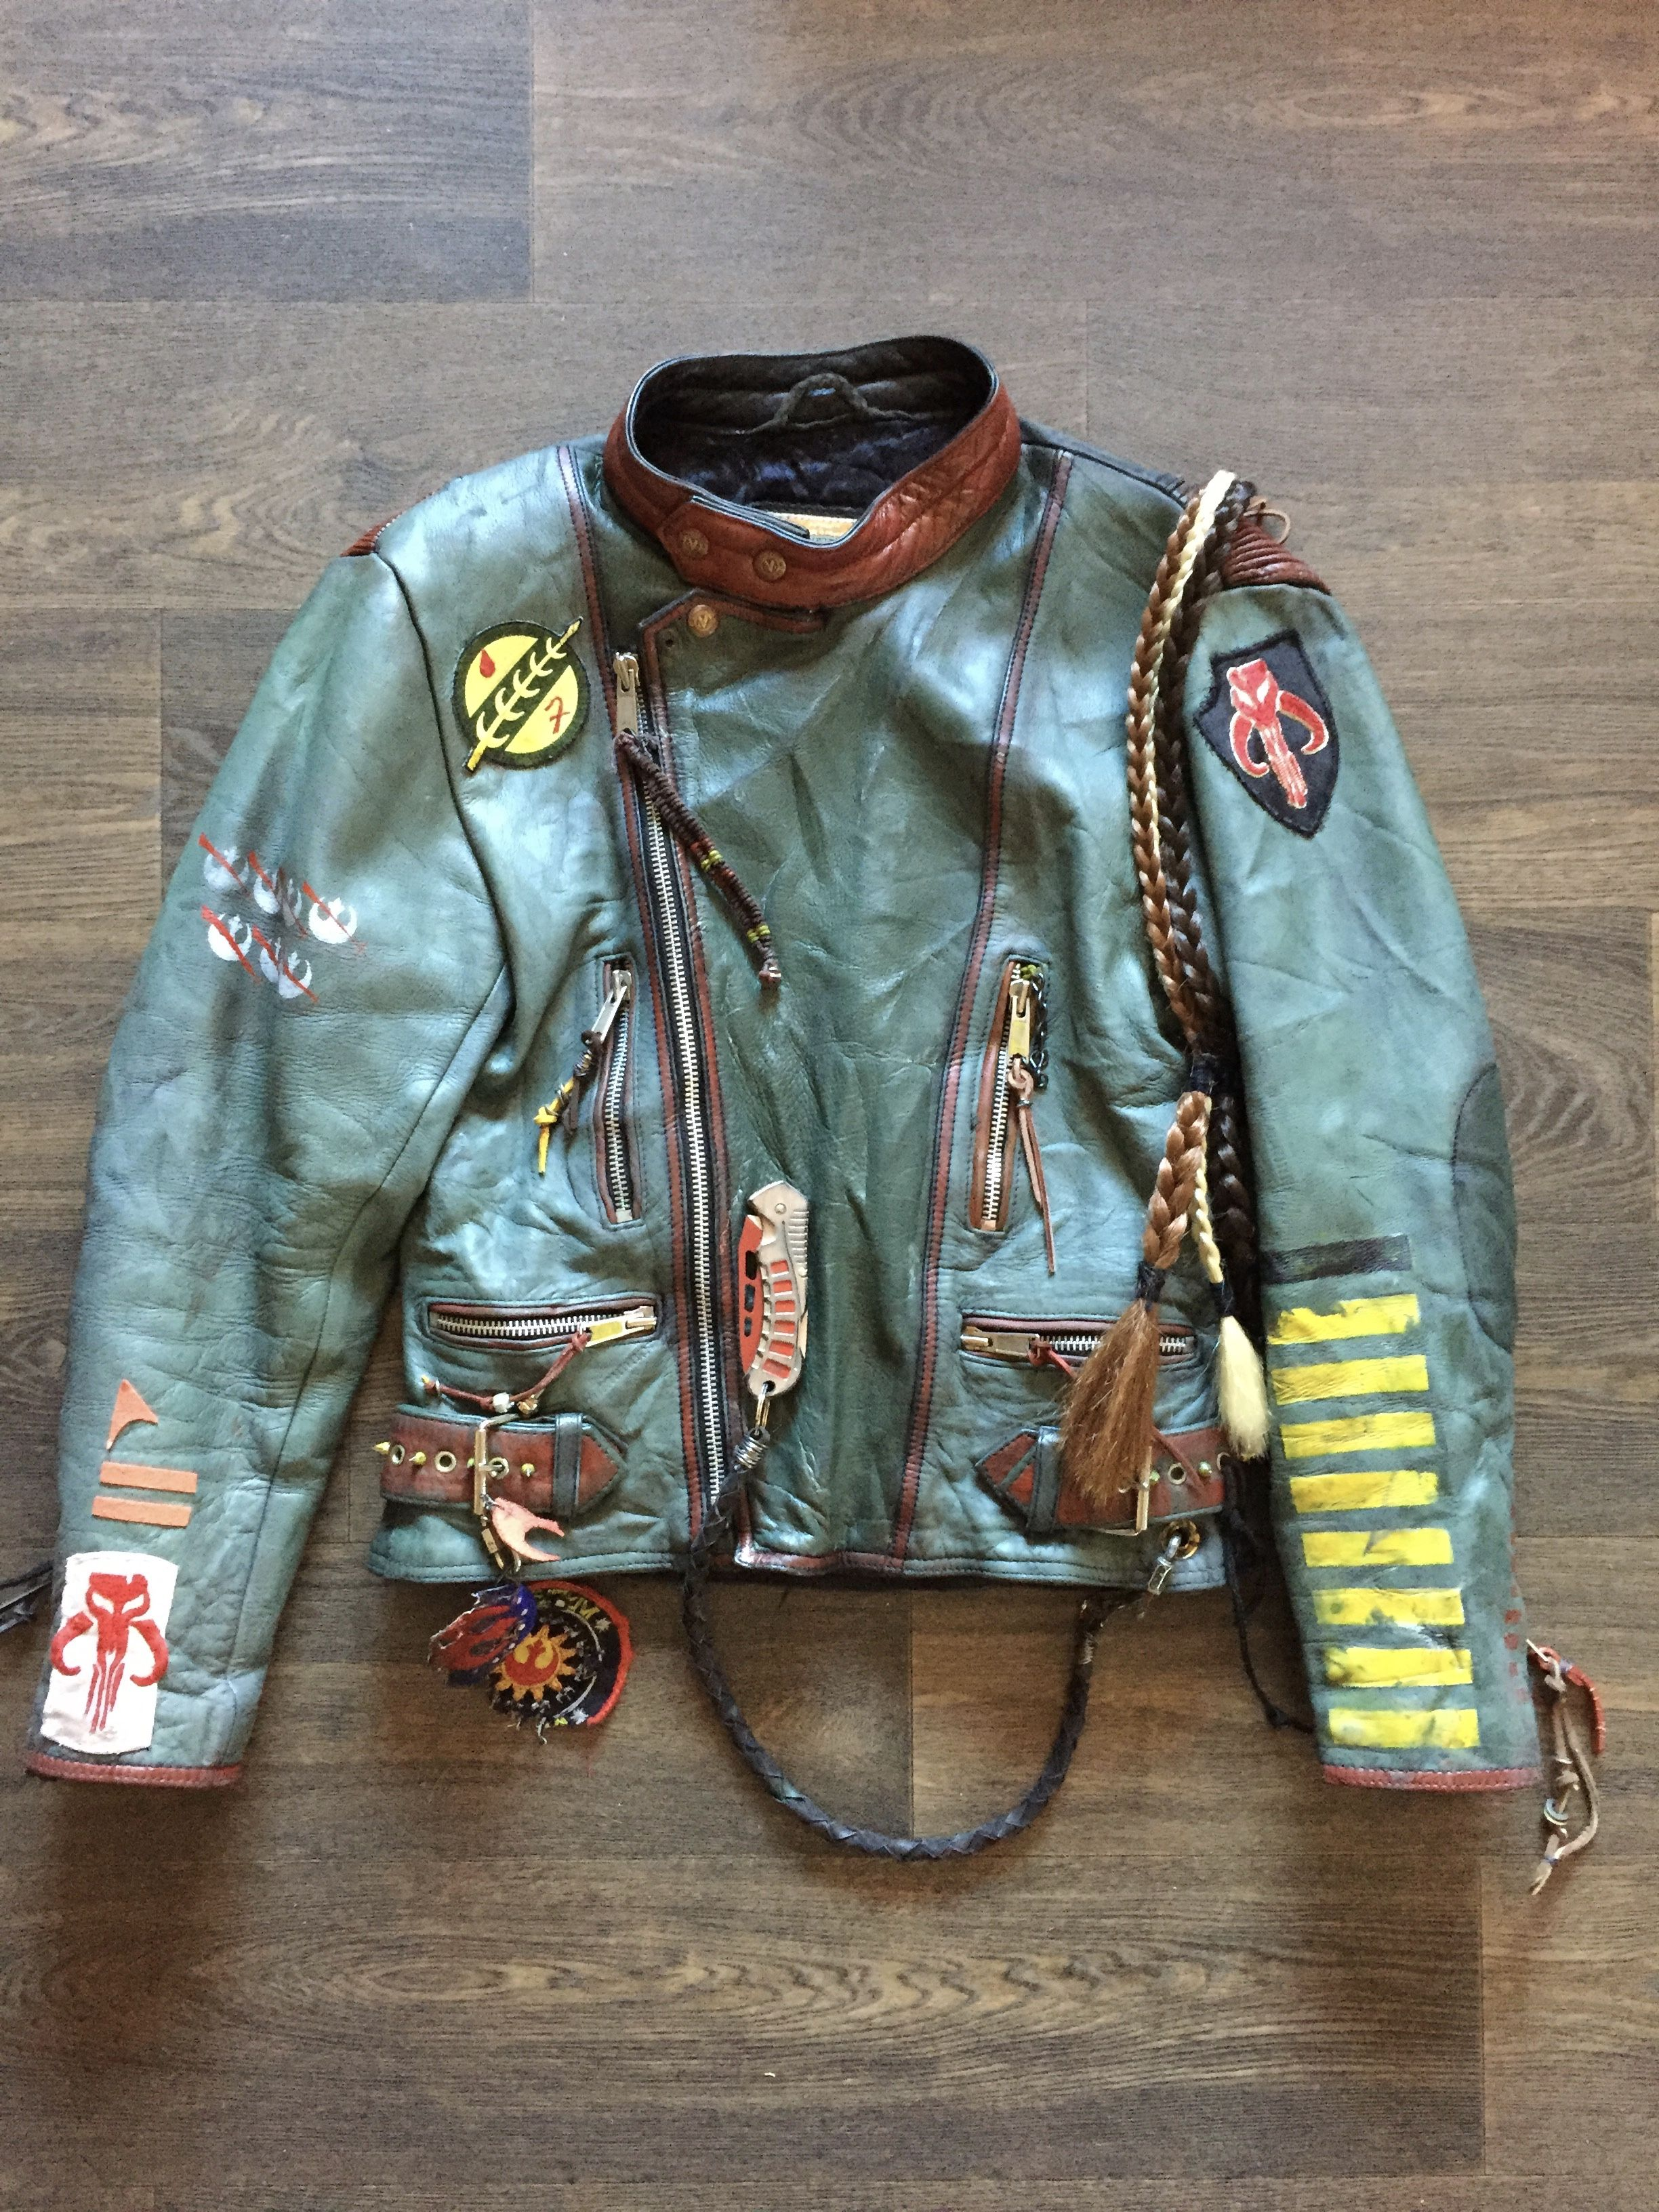 Pin By Dmfoxxart On D M Foxx Custom Jackets Mandalorian Armor Custom Jacket Riding Gear